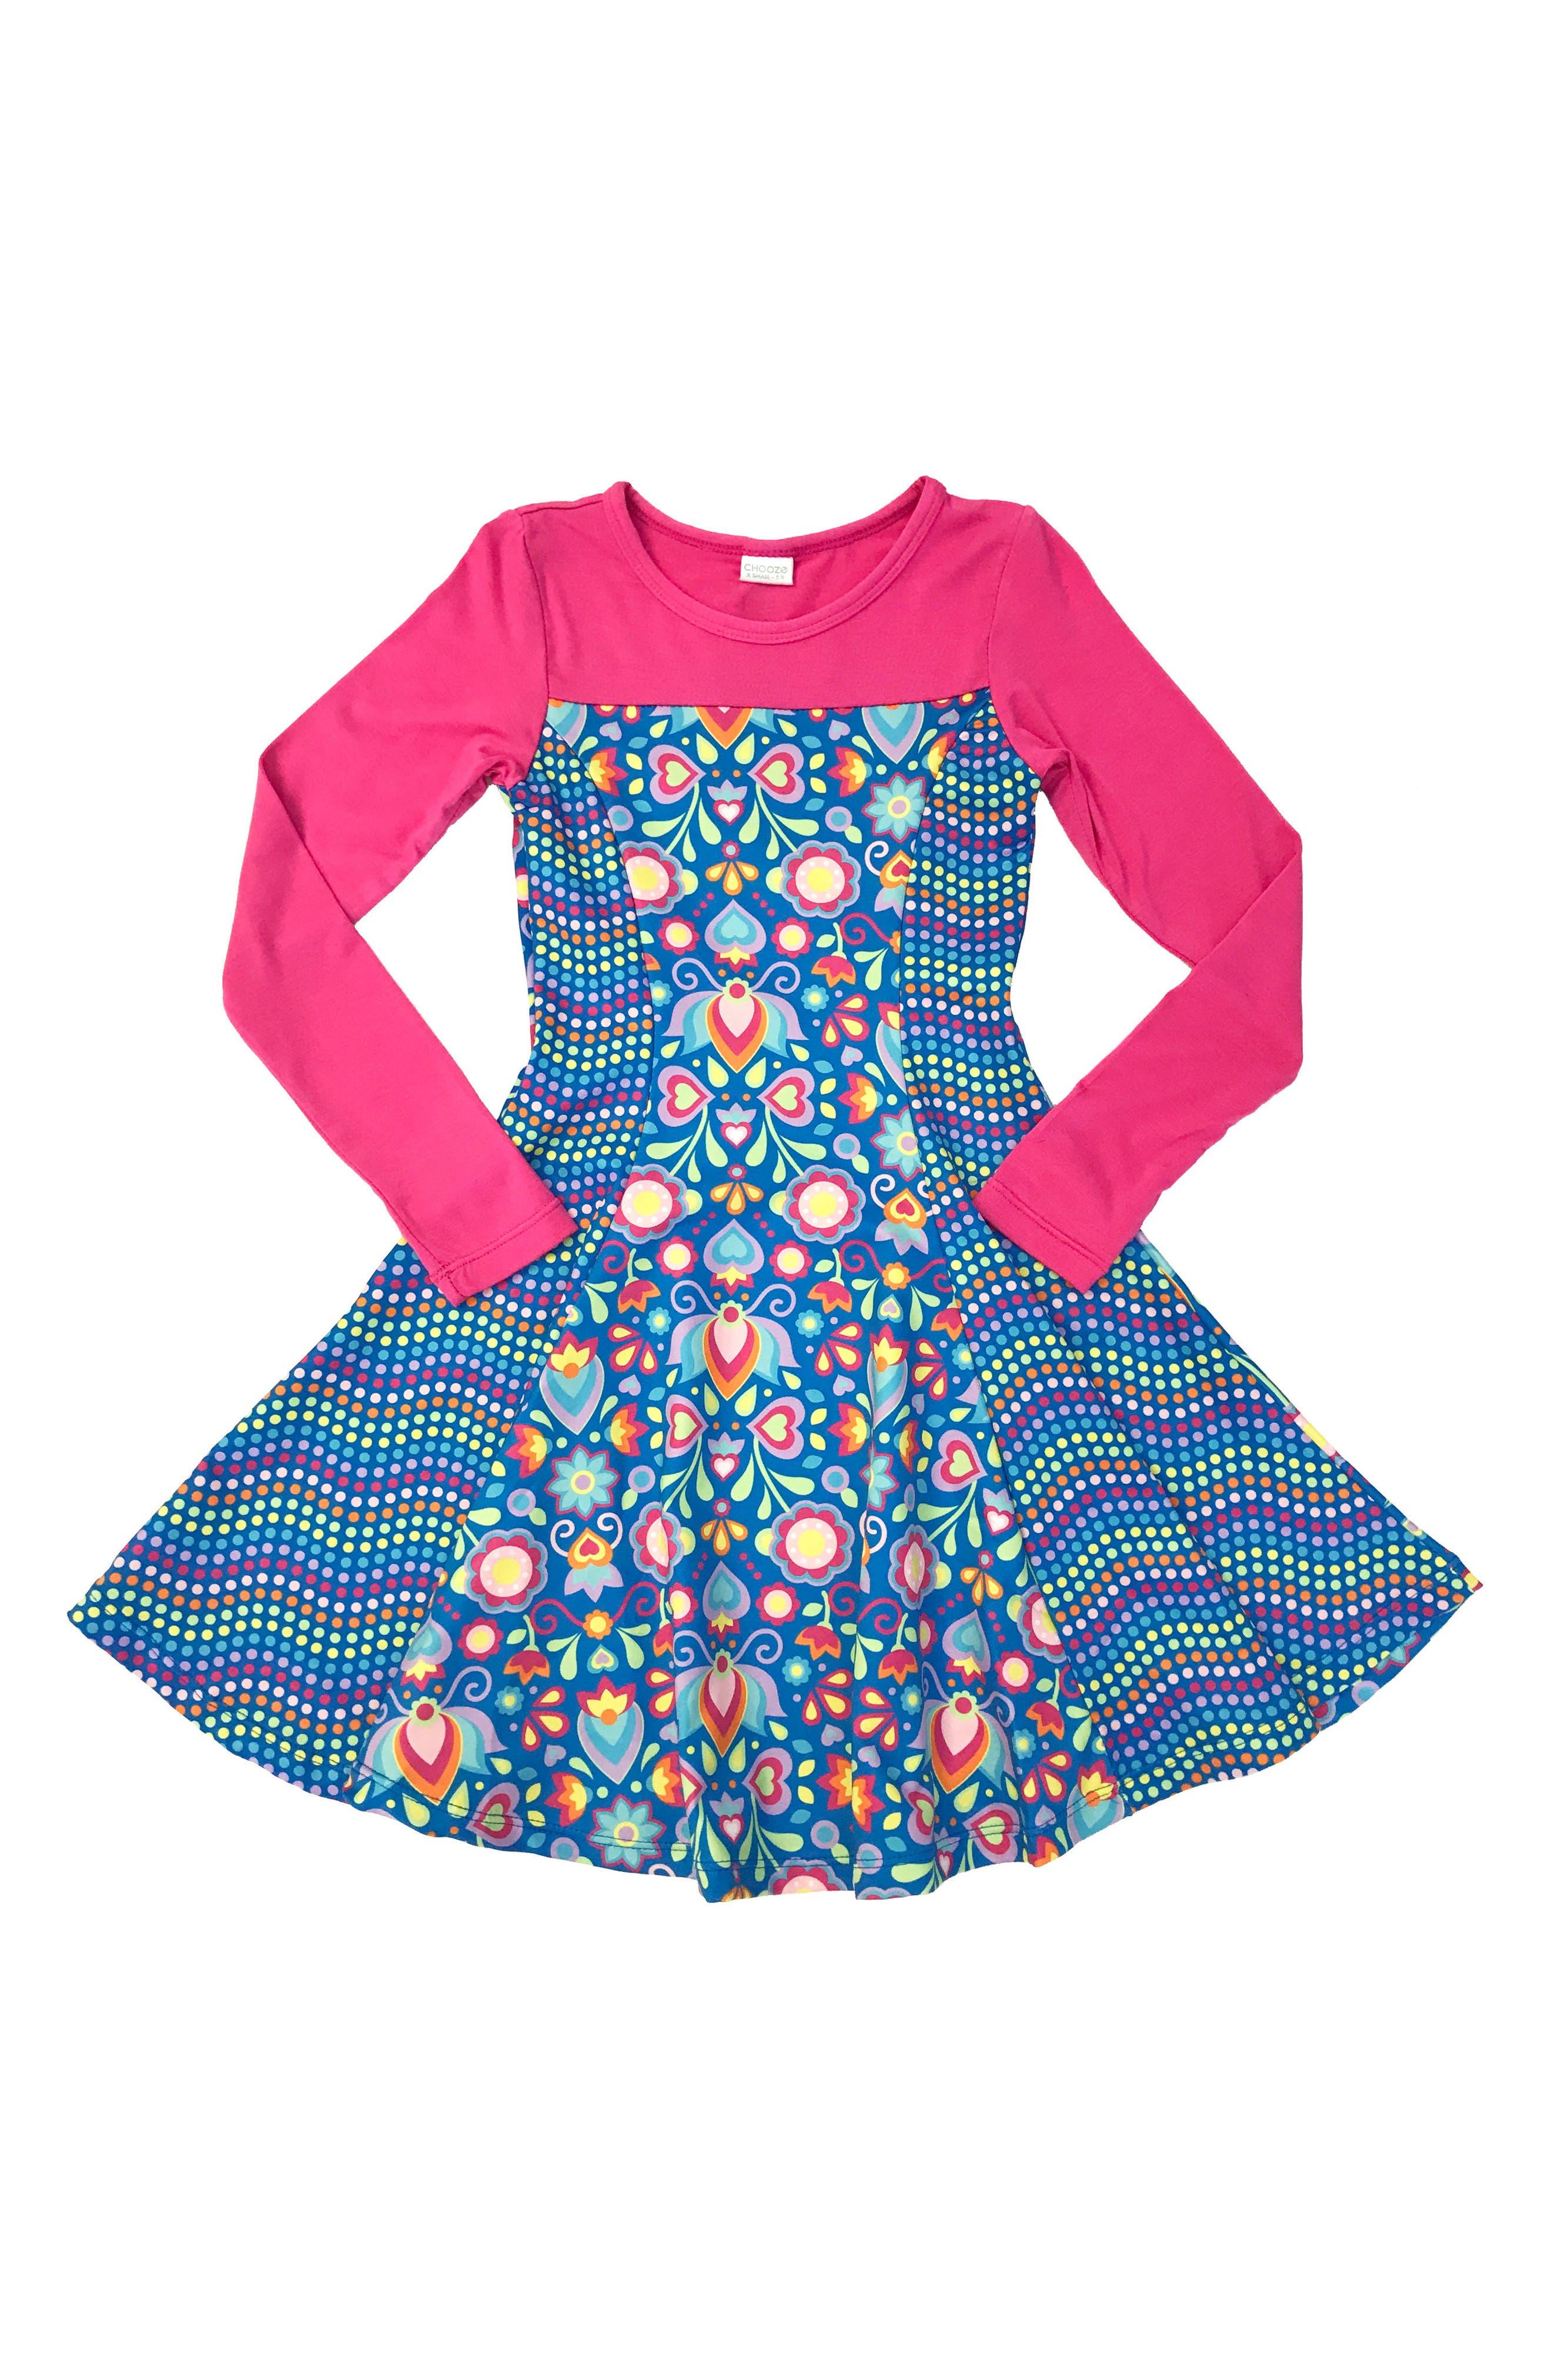 CHOOZE Lead Mixed Print Skater Dress (Little Girls & Big Girls)